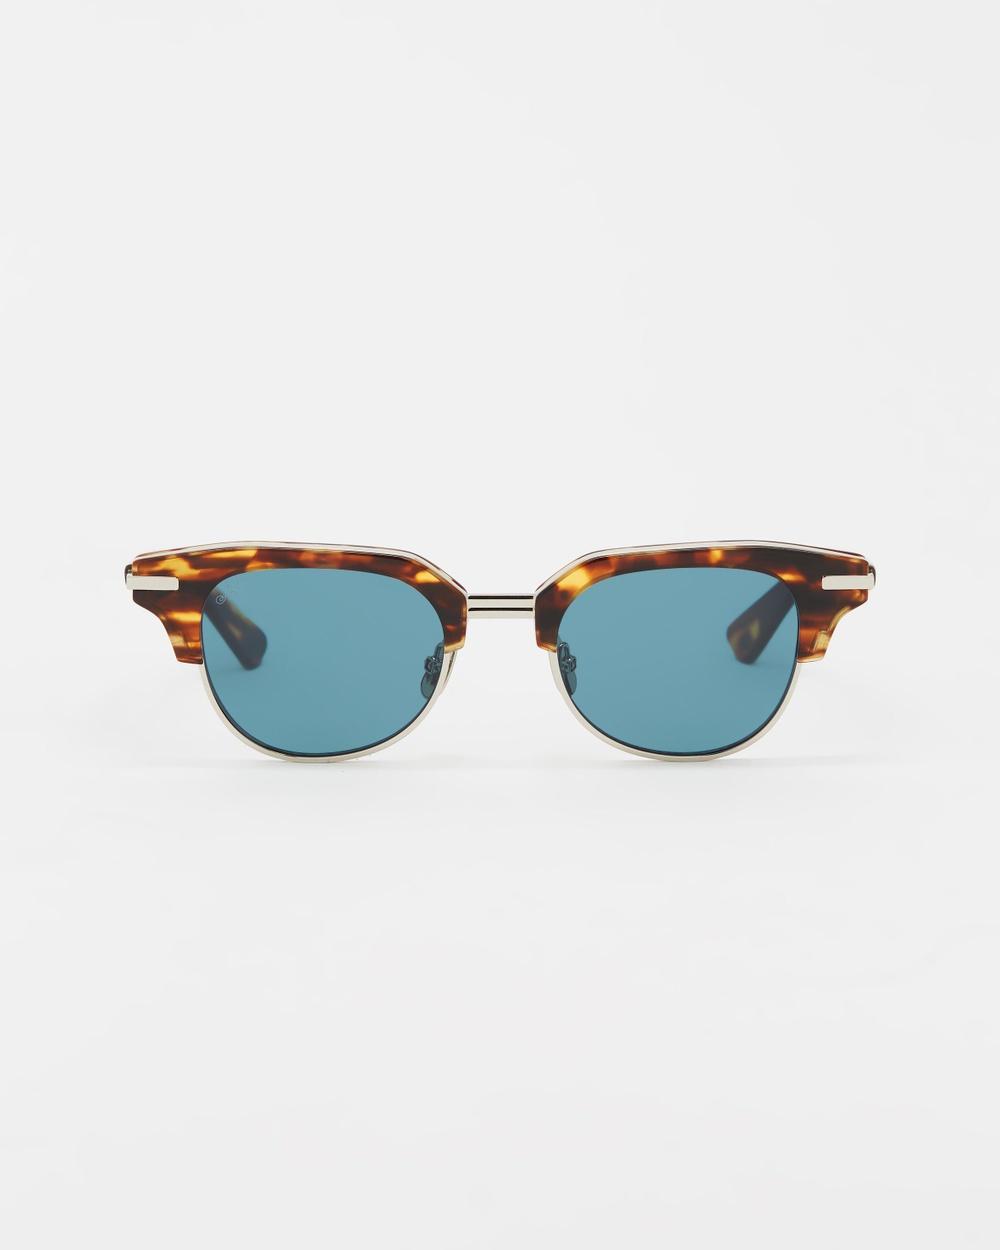 AKILA M.Y.C Sunglasses Tortoise, Viridian & Silver